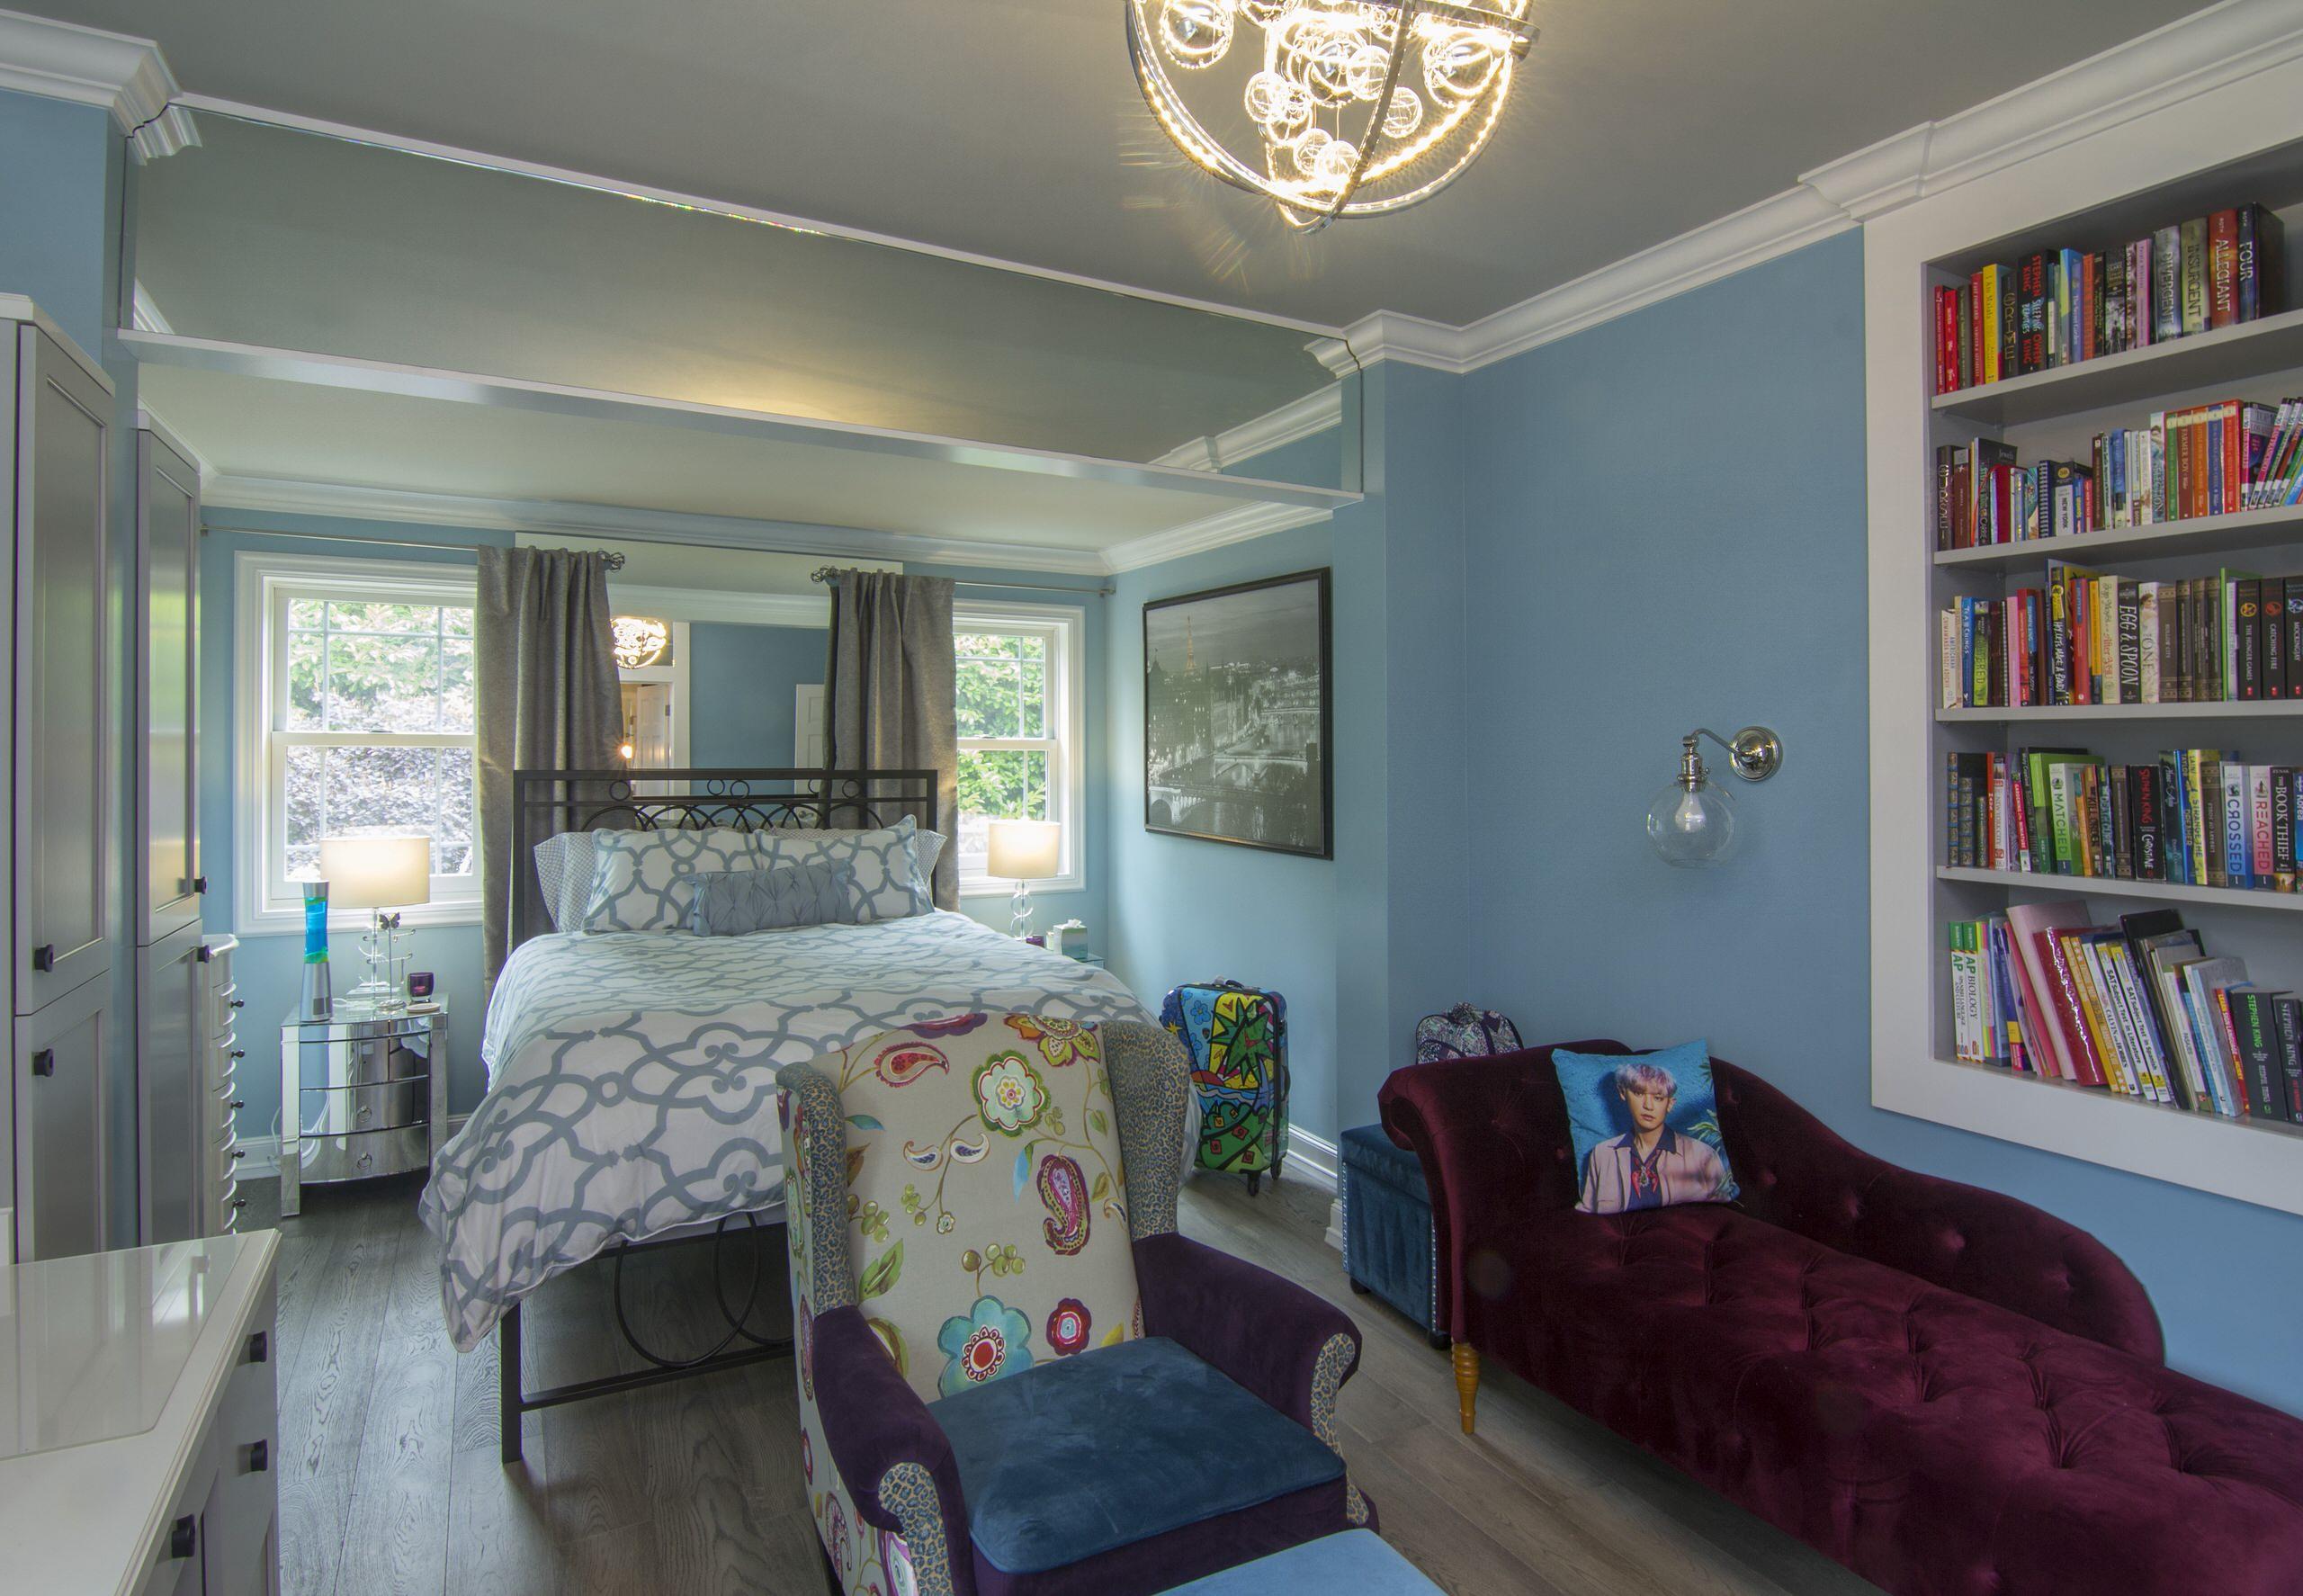 Seattle's Magnolia Neighborhood - Major Interior Overhaul - Home Birth Year 1960